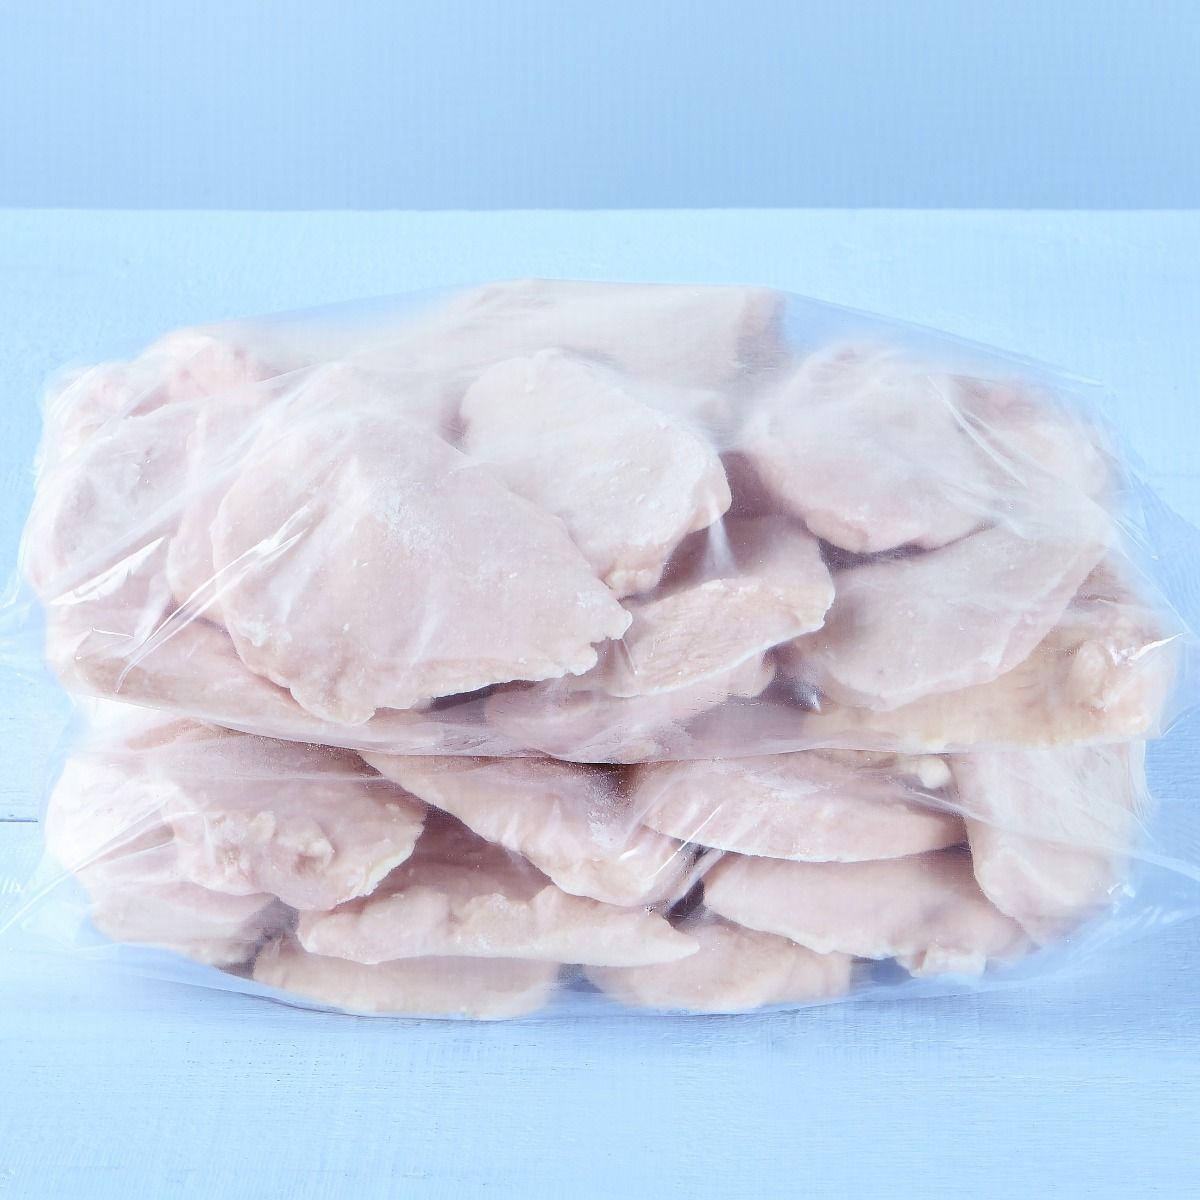 Boneless, skinless chicken breasts (seasoned, 2.54-3.24 oz)